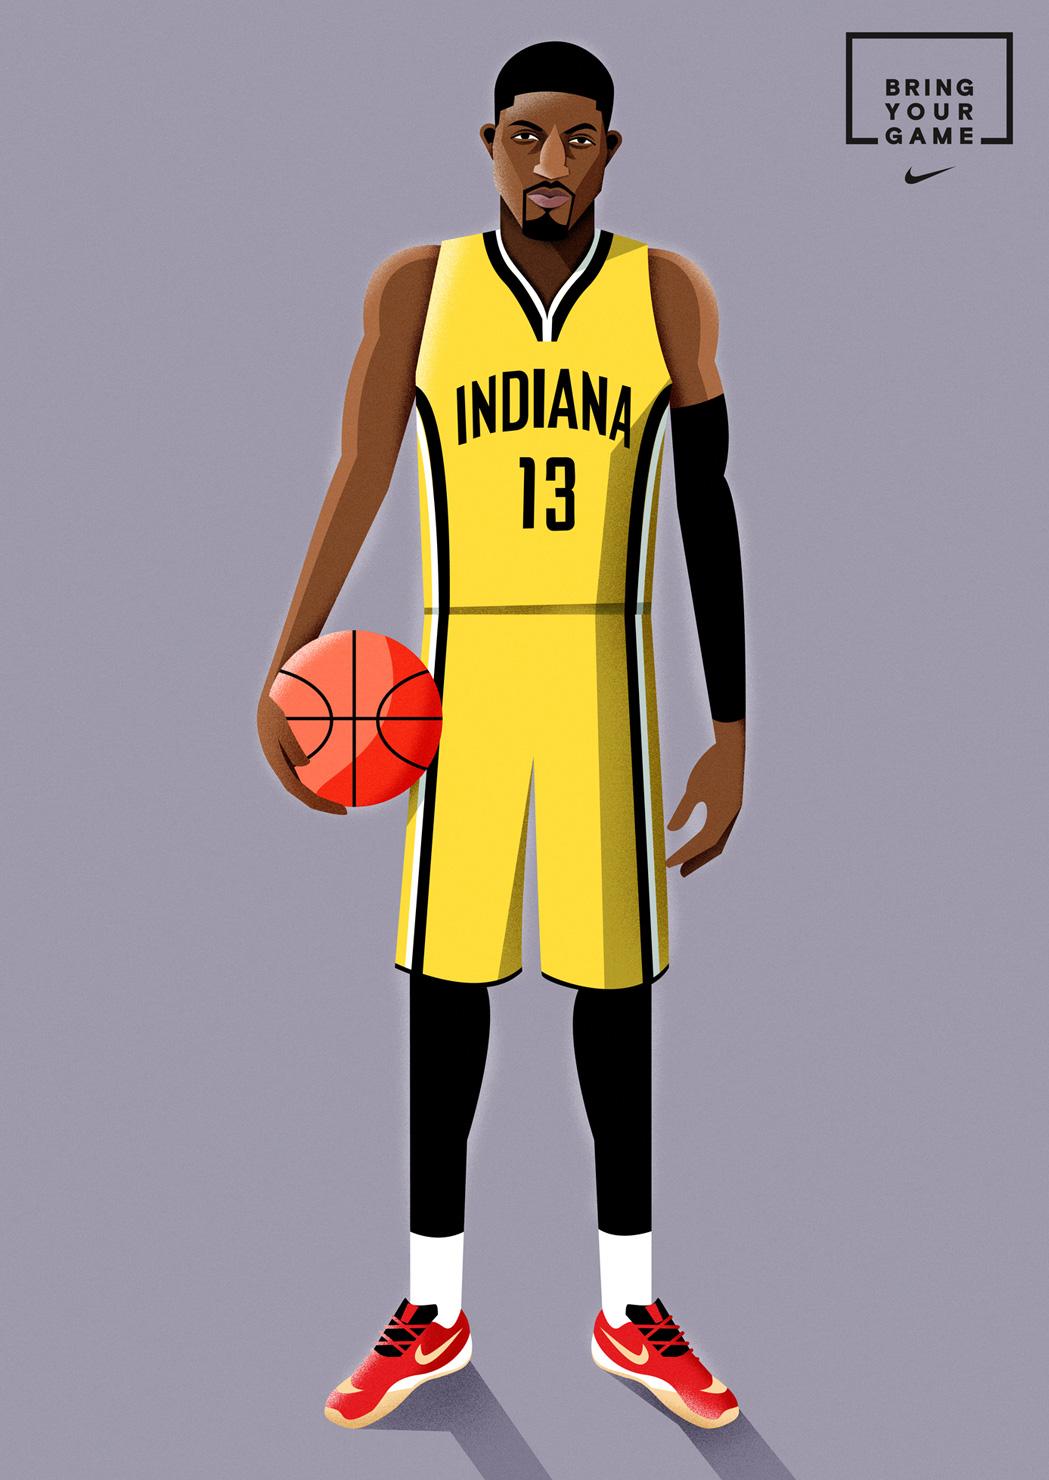 freelance illustrator dale edwin murray nike basketball all star illustration